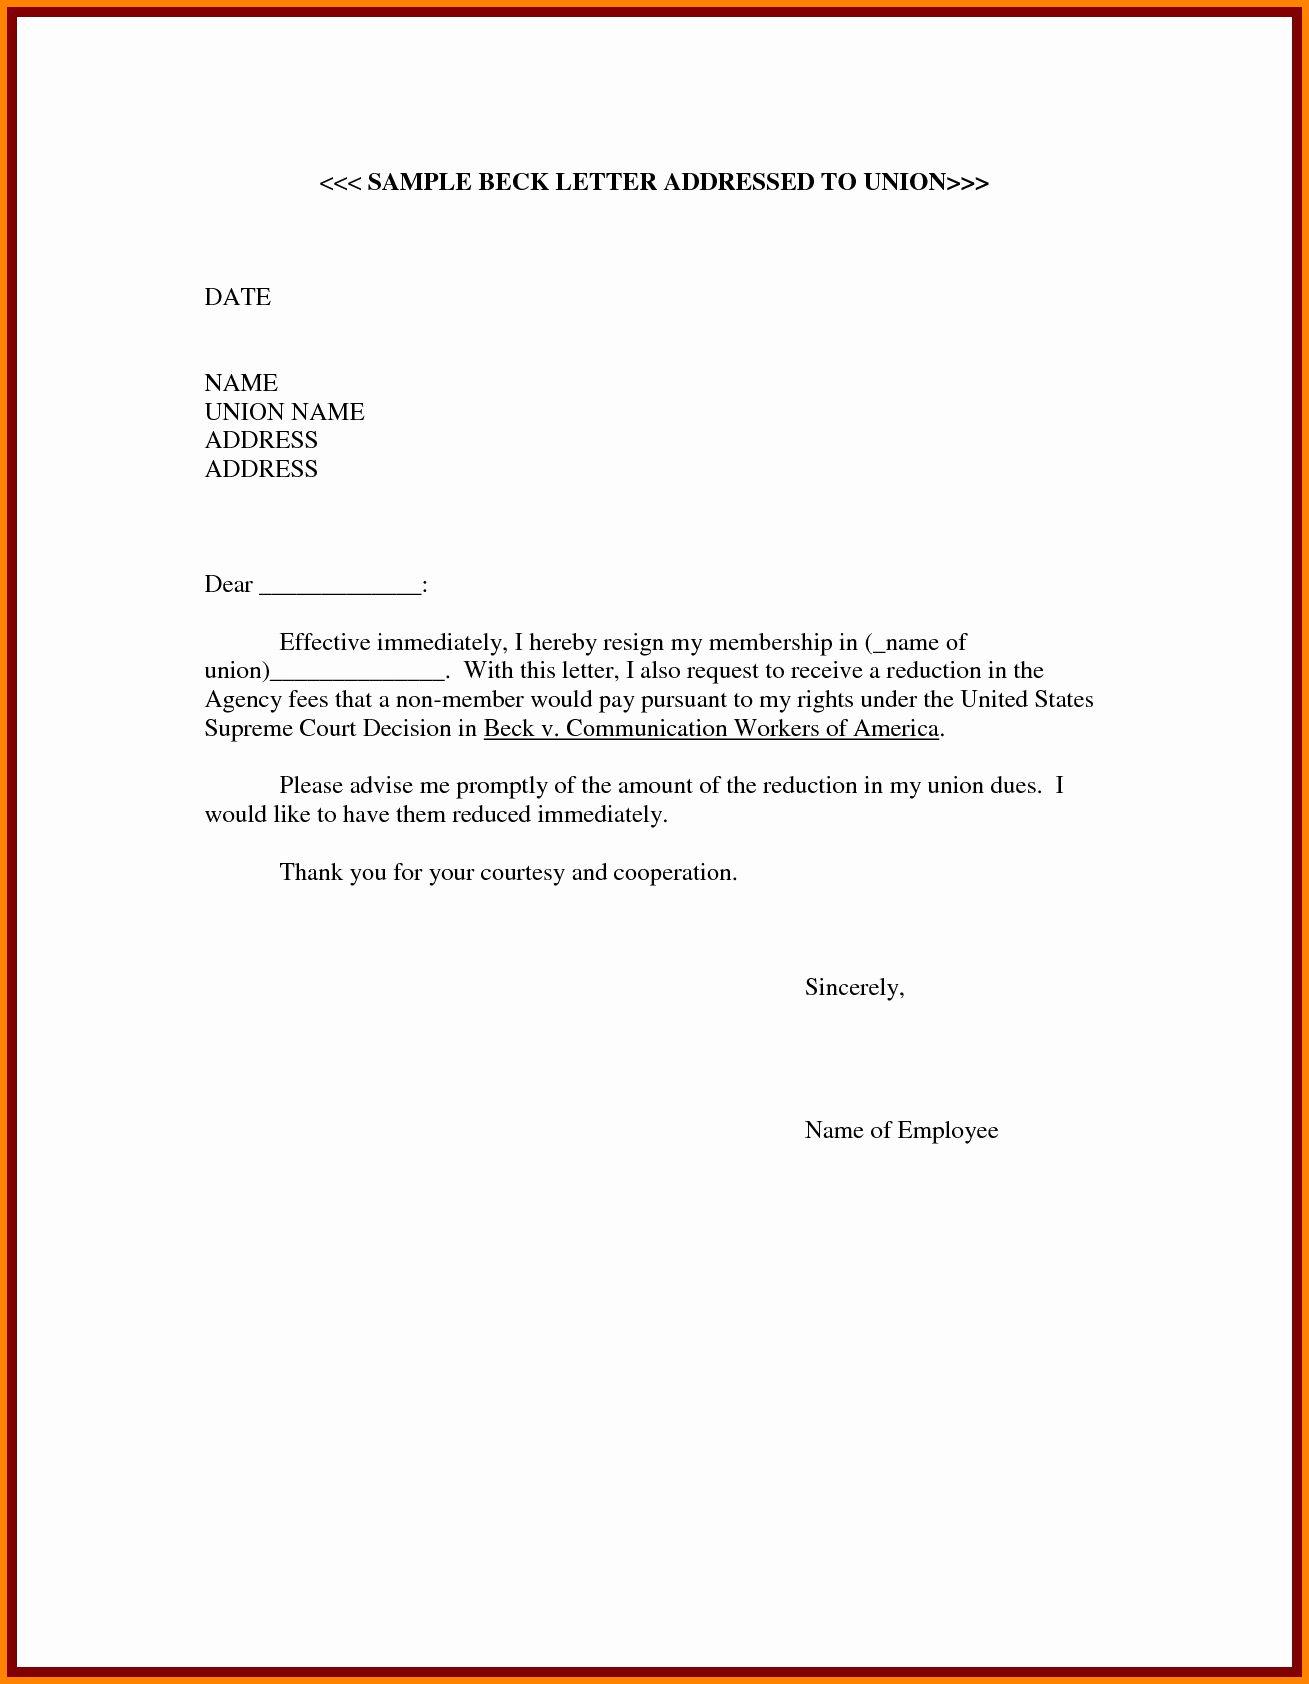 25++ Resignation letter effective immediately samples ideas in 2021